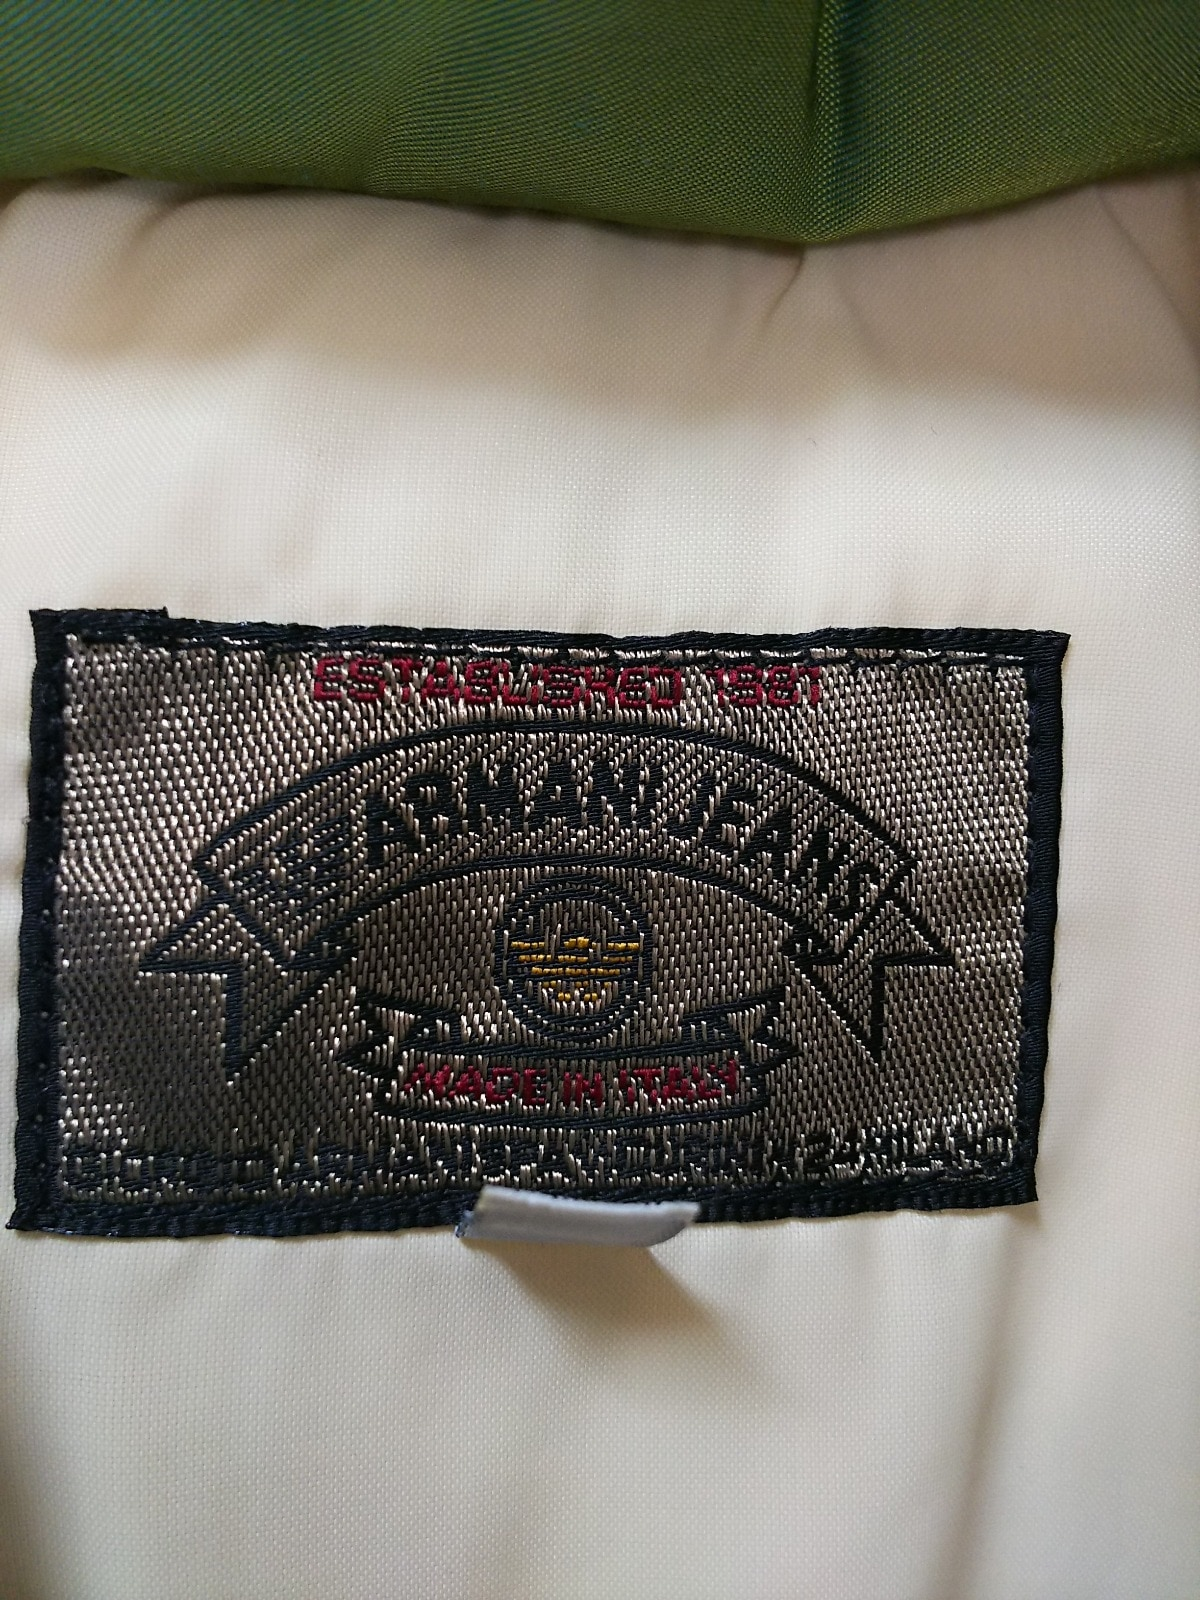 ARMANIJEANS(アルマーニジーンズ)のダウンベスト